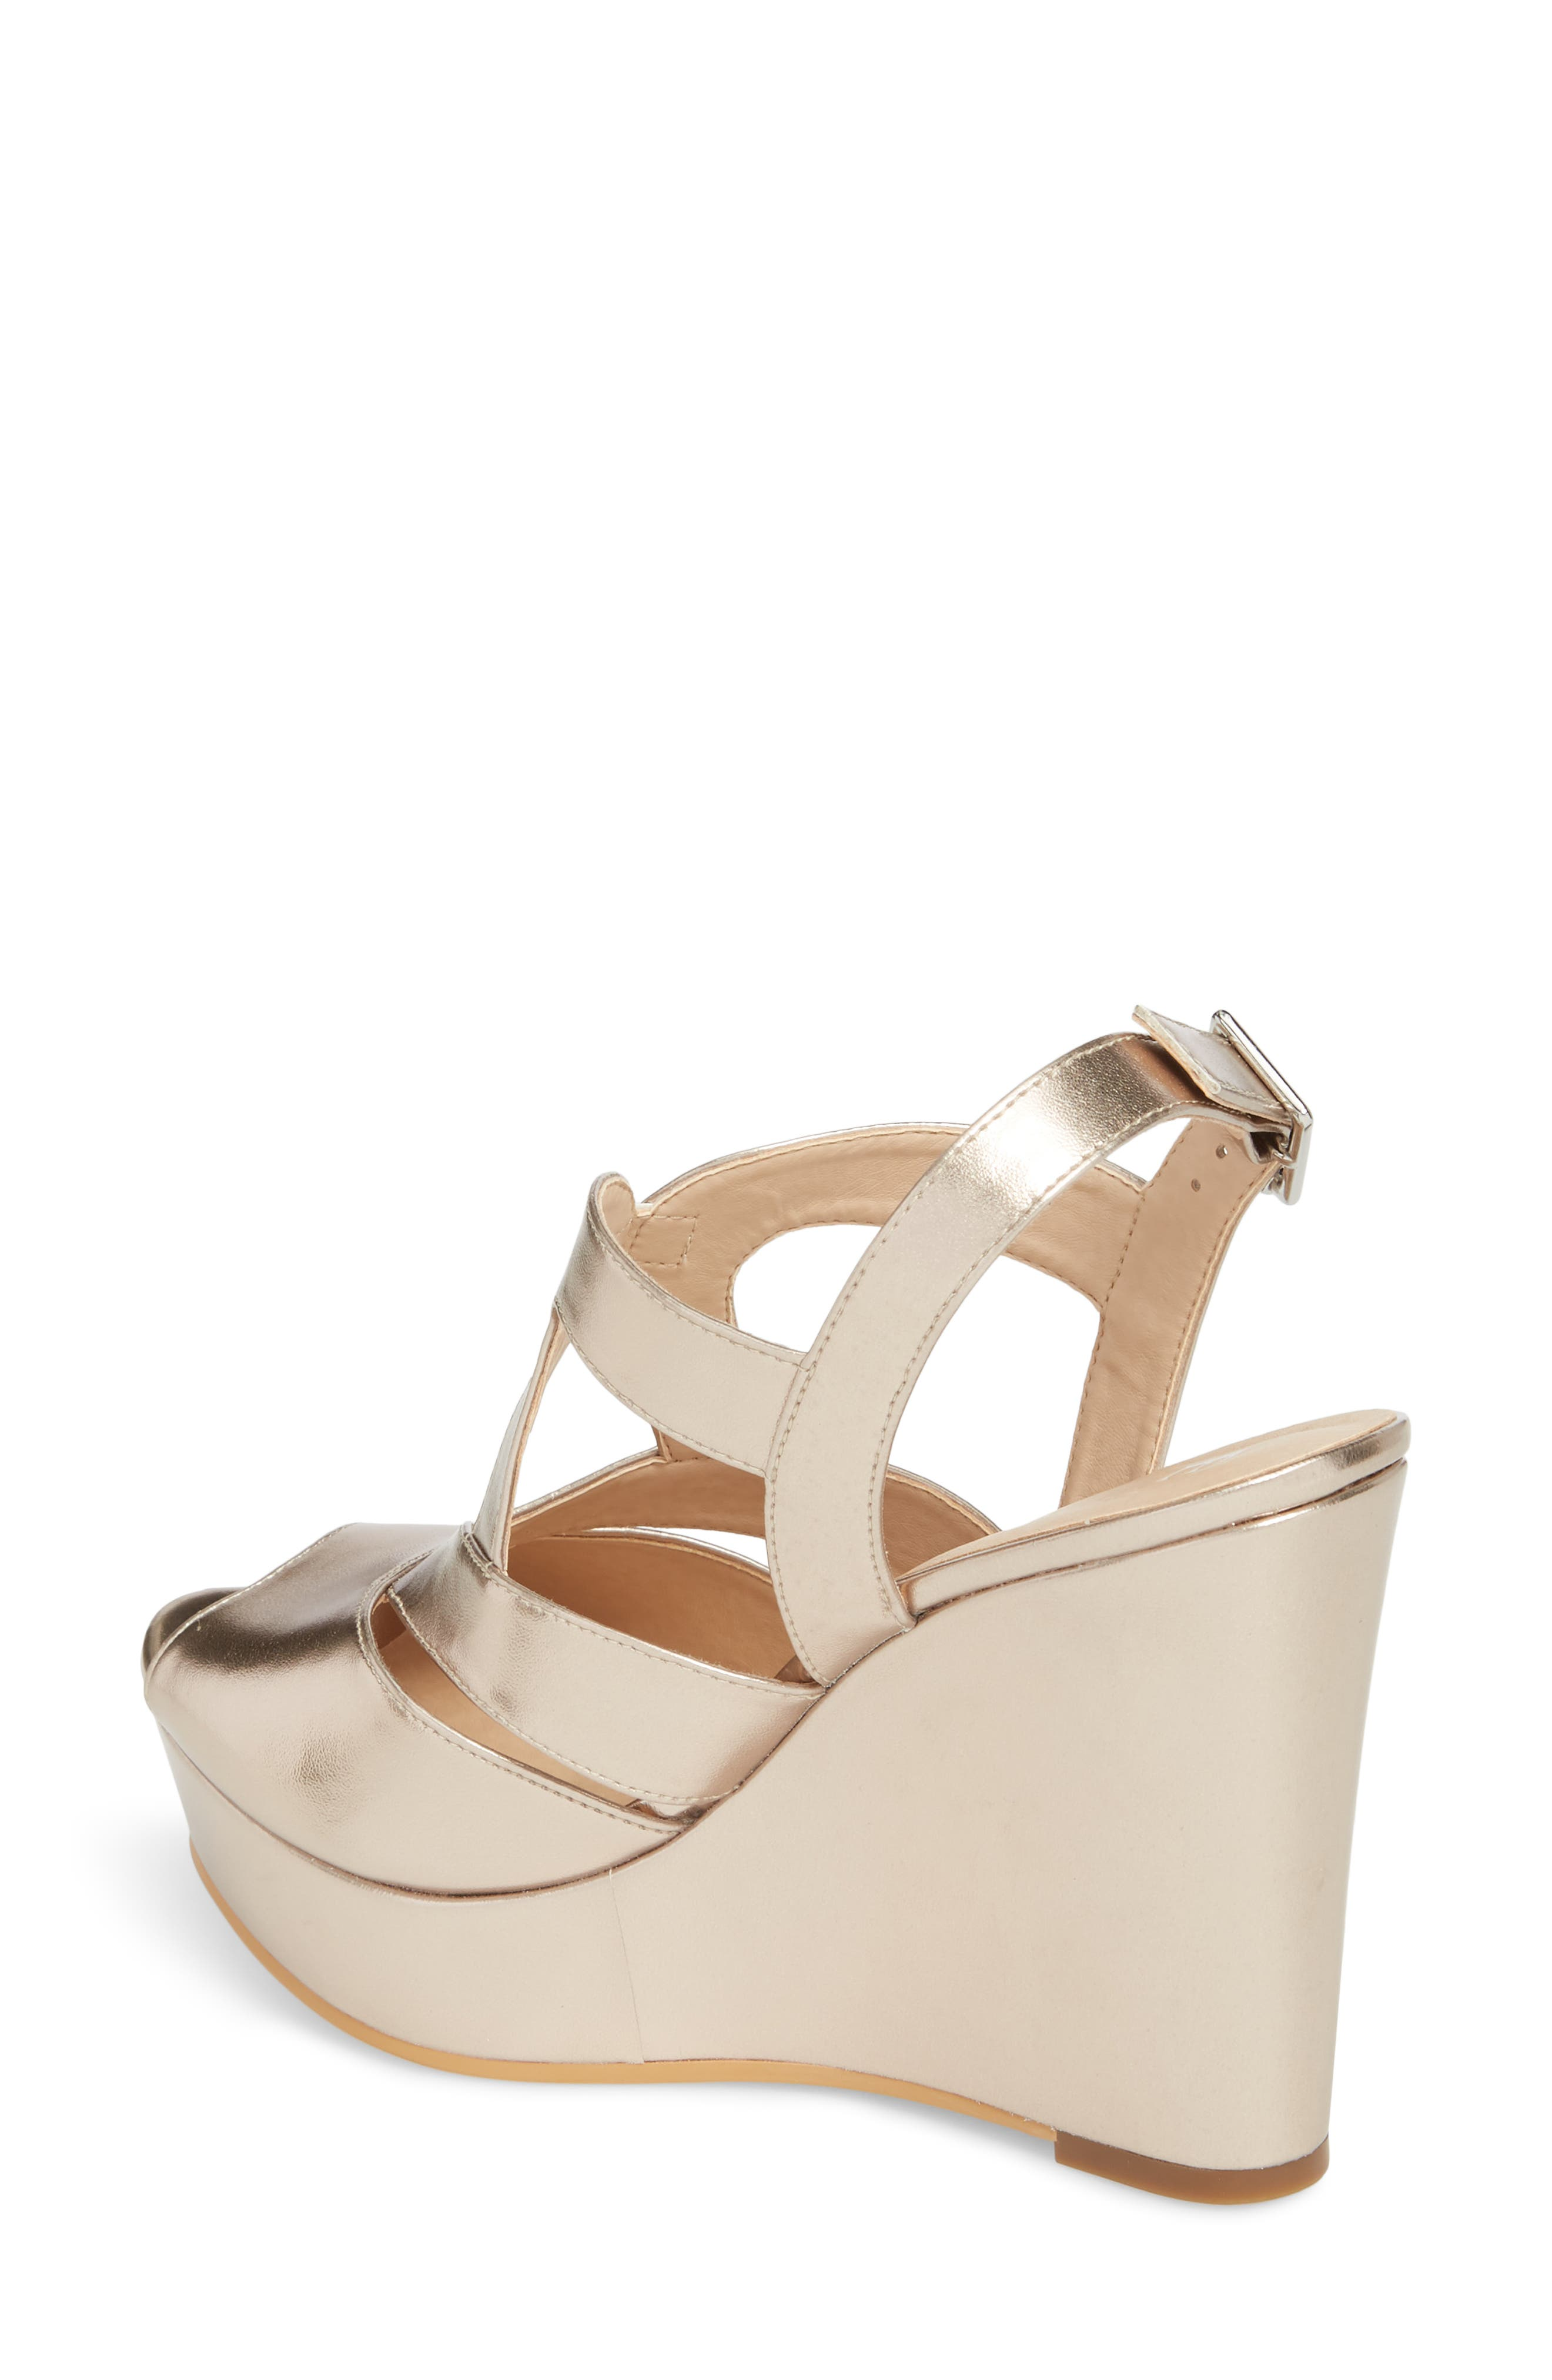 Sunny Platform Wedge Sandal,                             Alternate thumbnail 8, color,